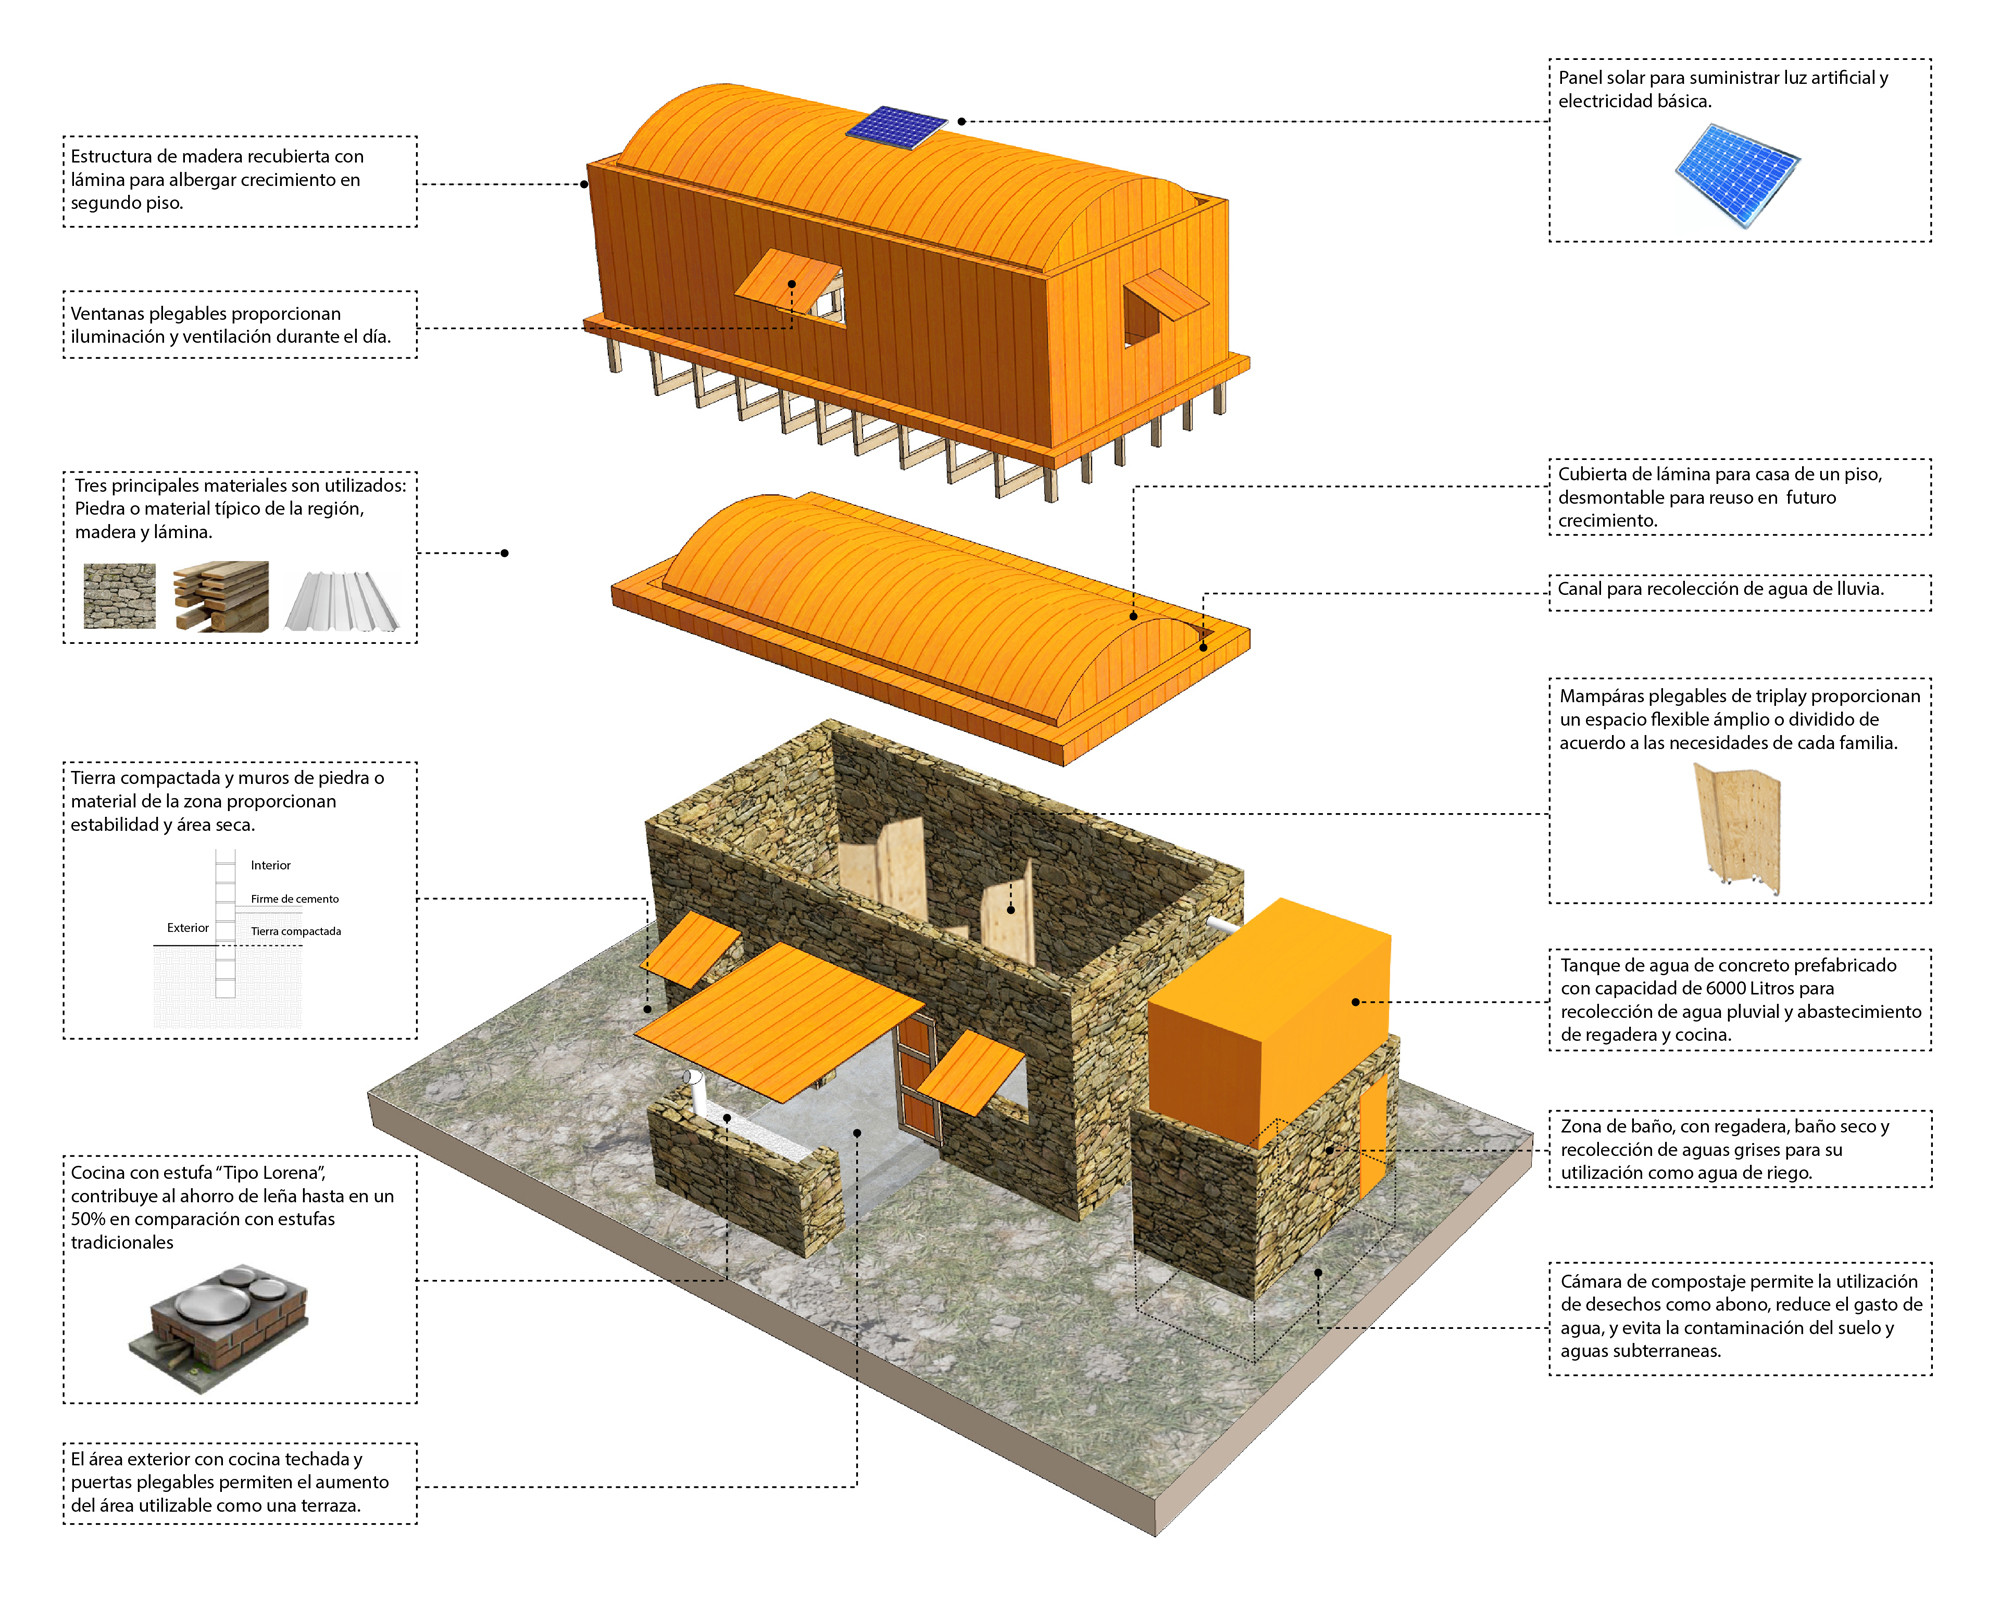 San miguel de allende tag archdaily m xico for Conceptualizacion de la arquitectura